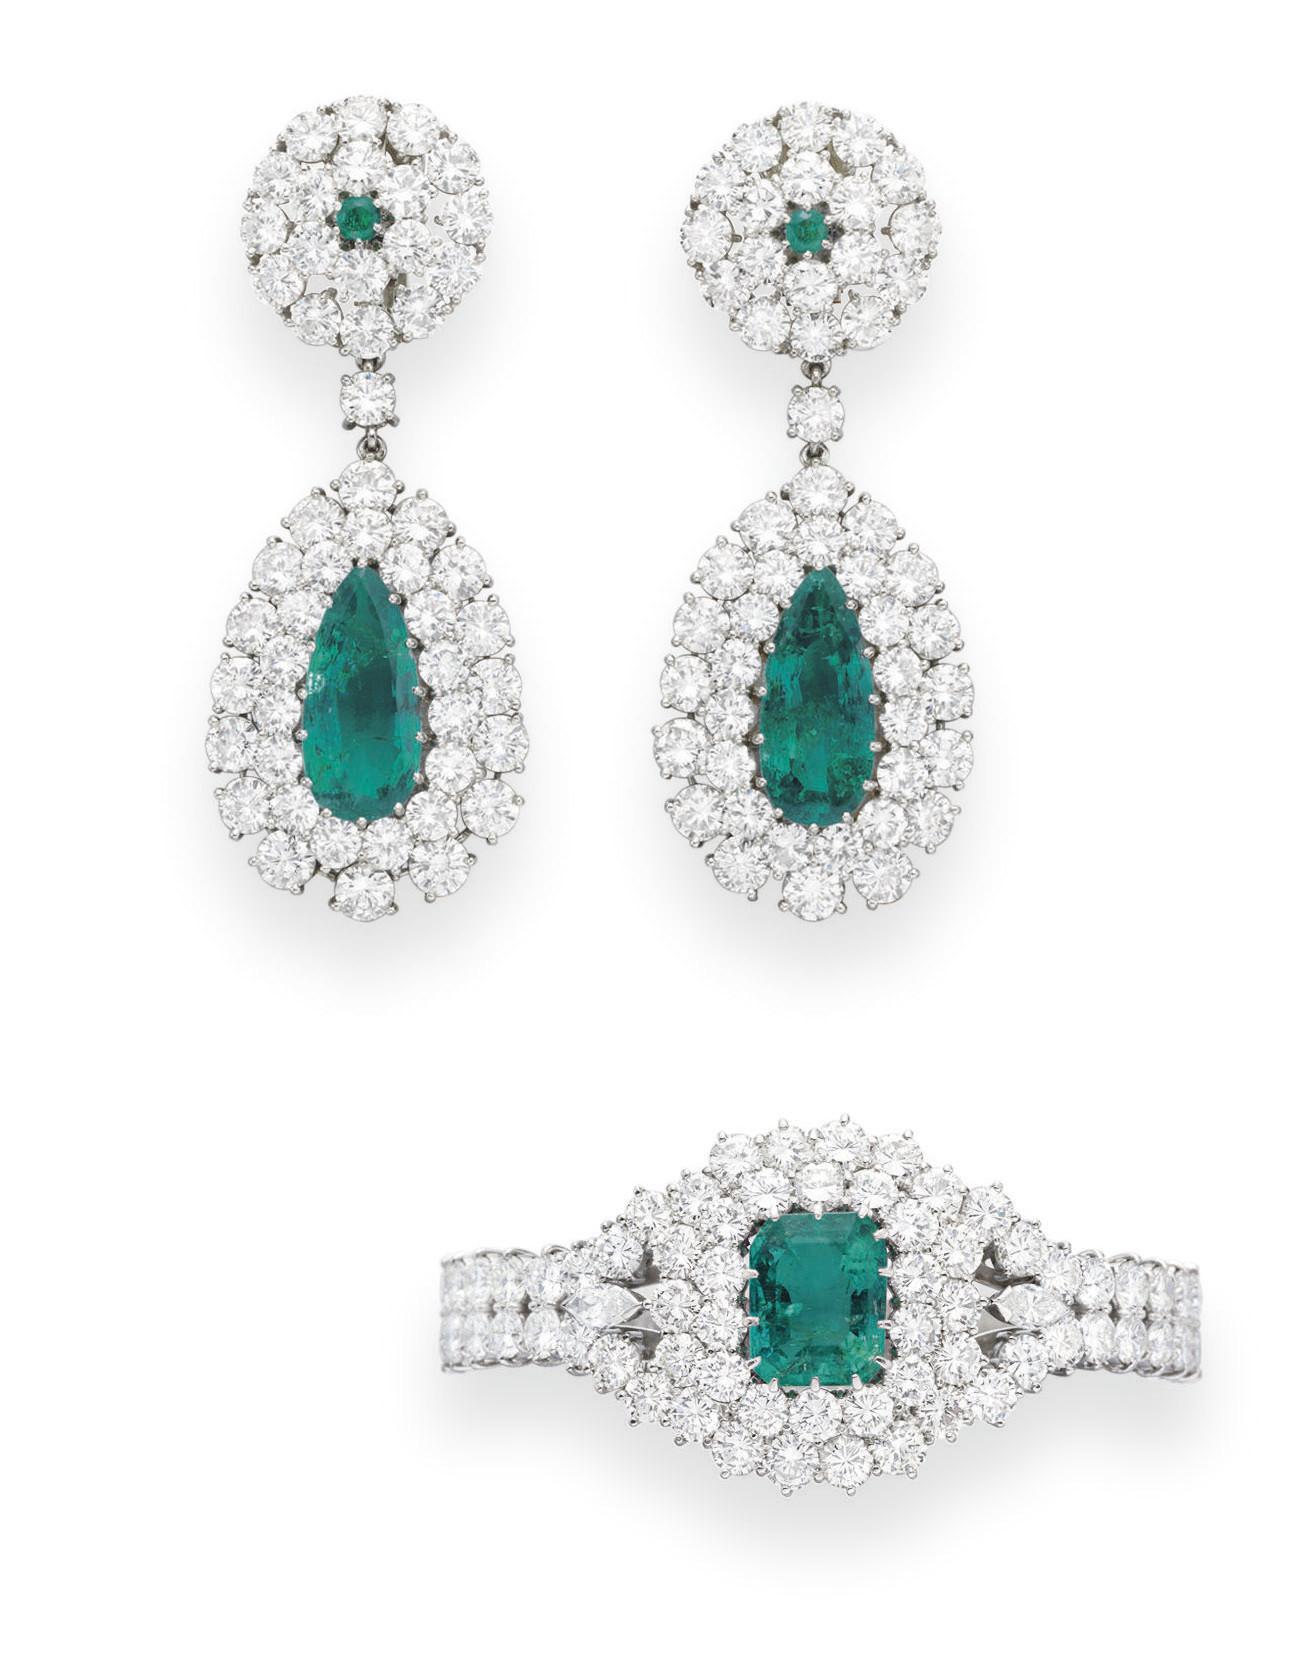 A SET OF EMERALD AND DIAMOND J